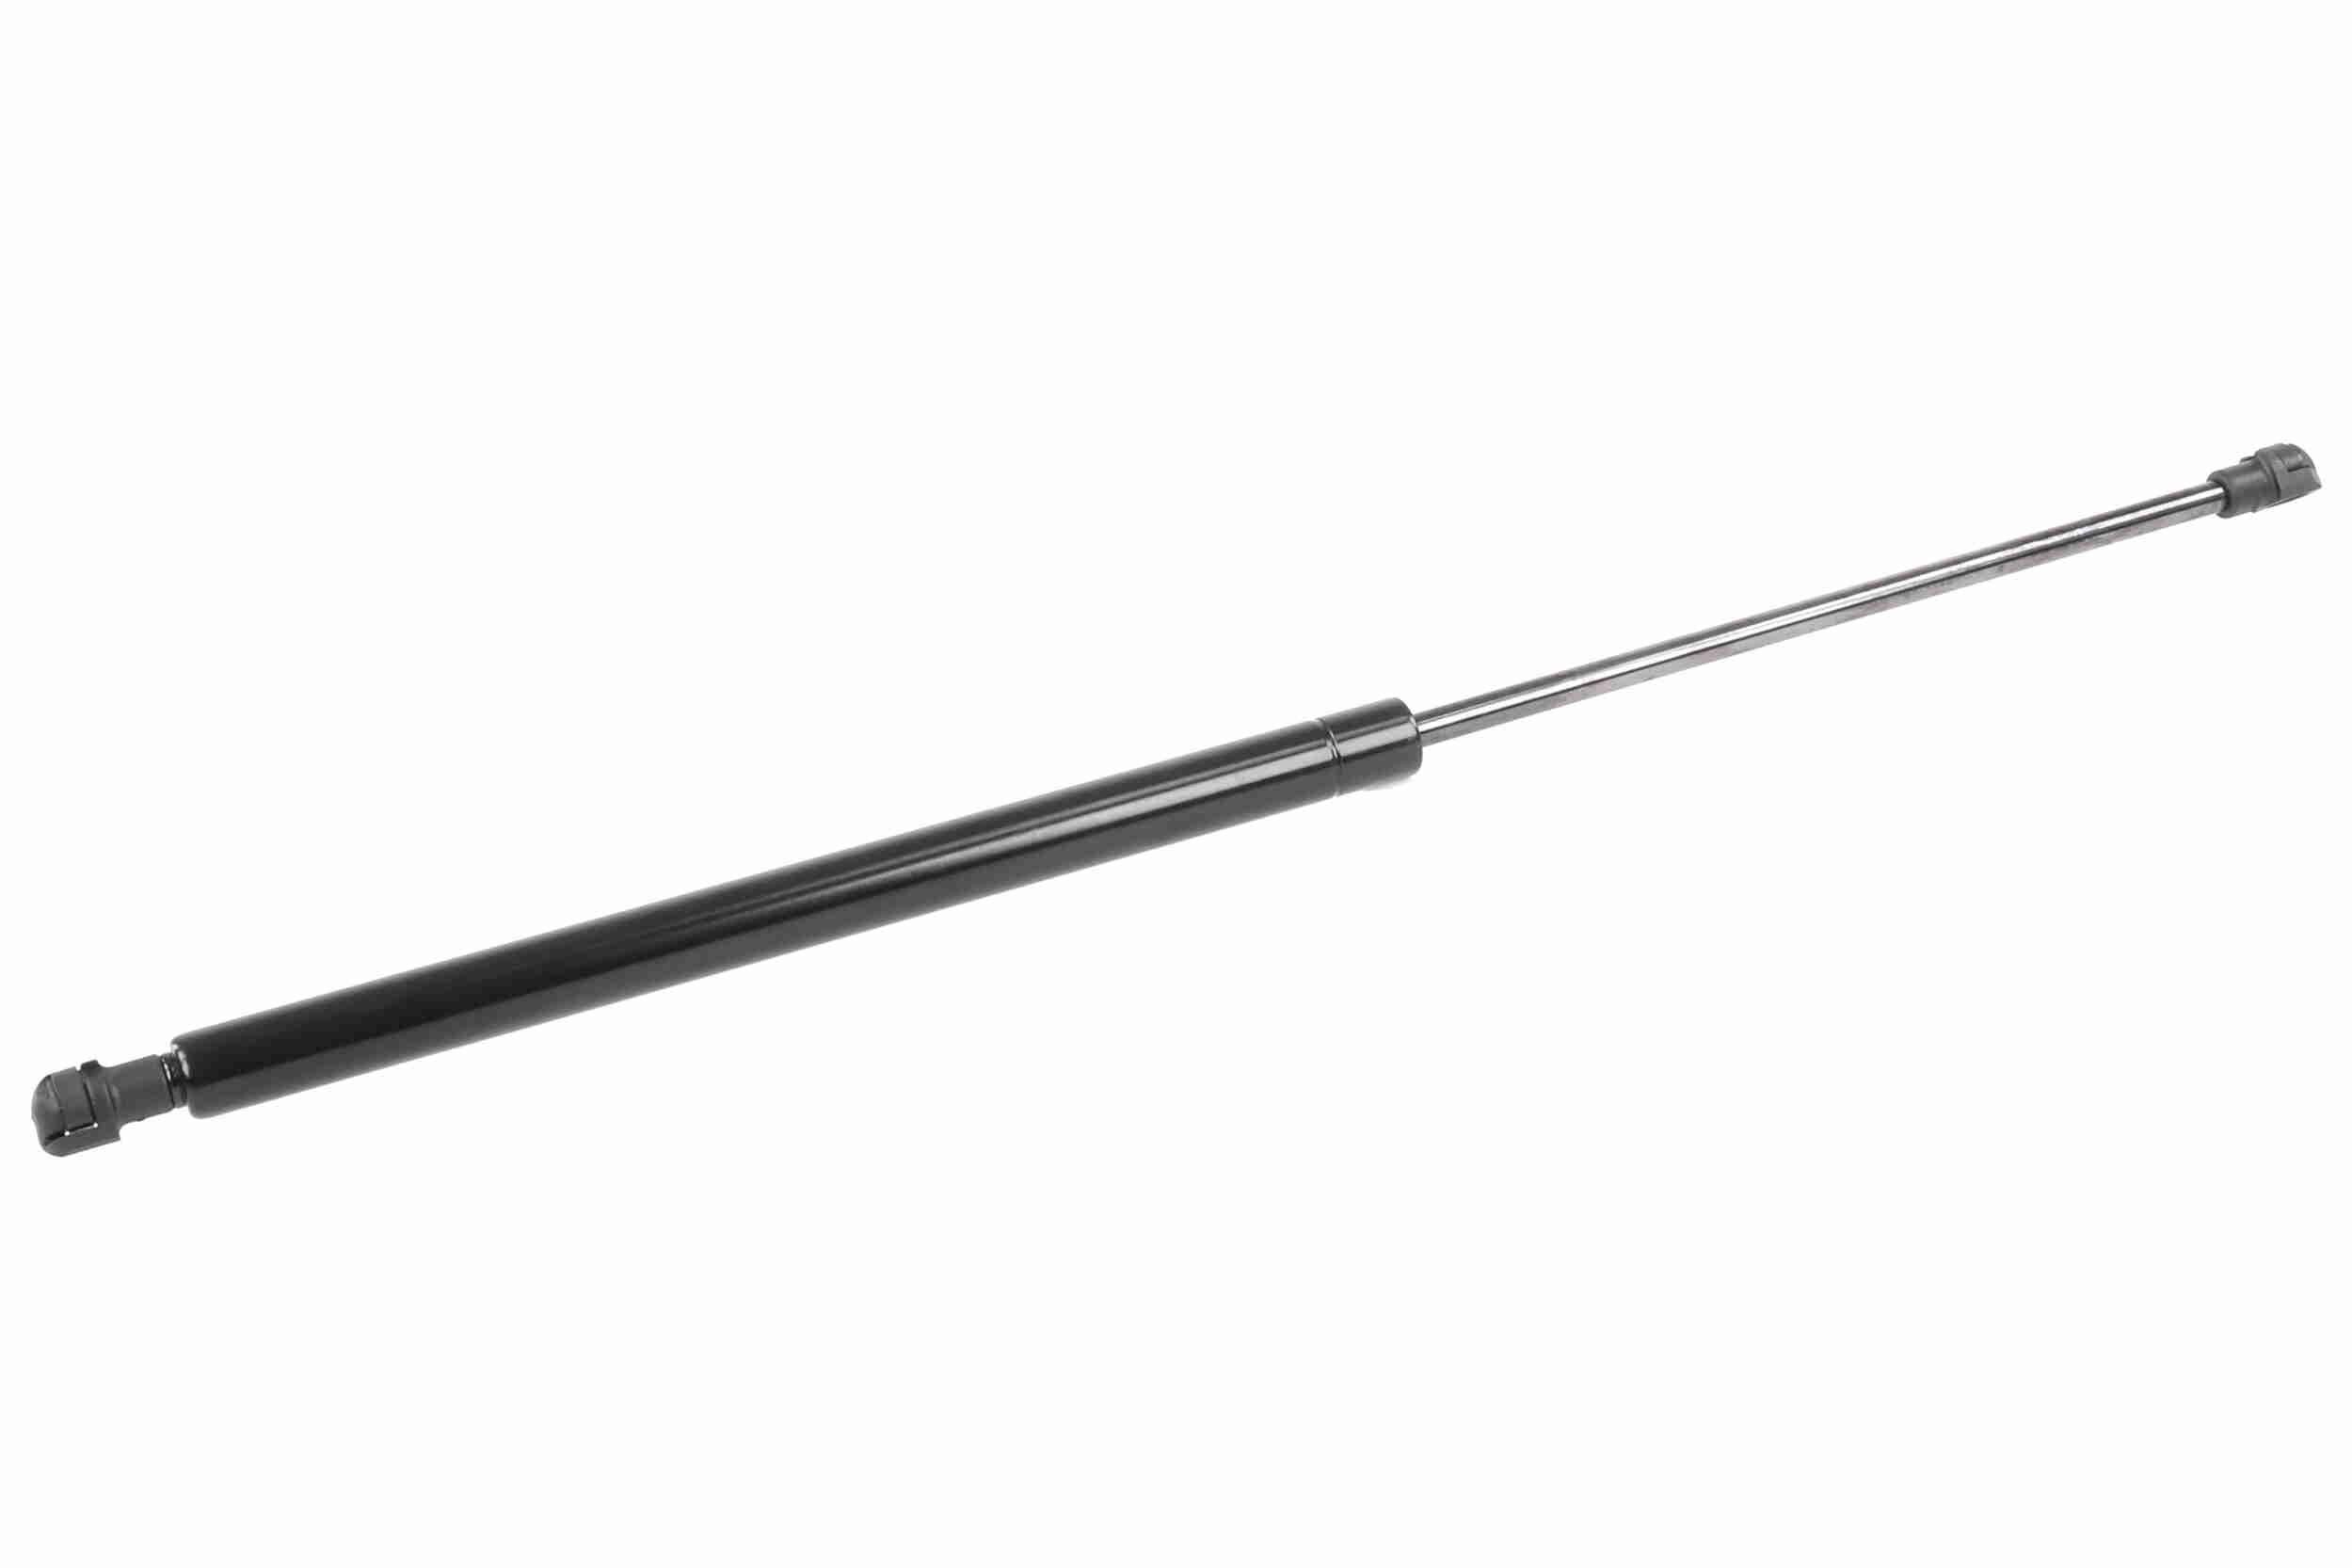 NISSAN ALMERA 2014 Kofferraum Dämpfer - Original ACKOJA A38-0075